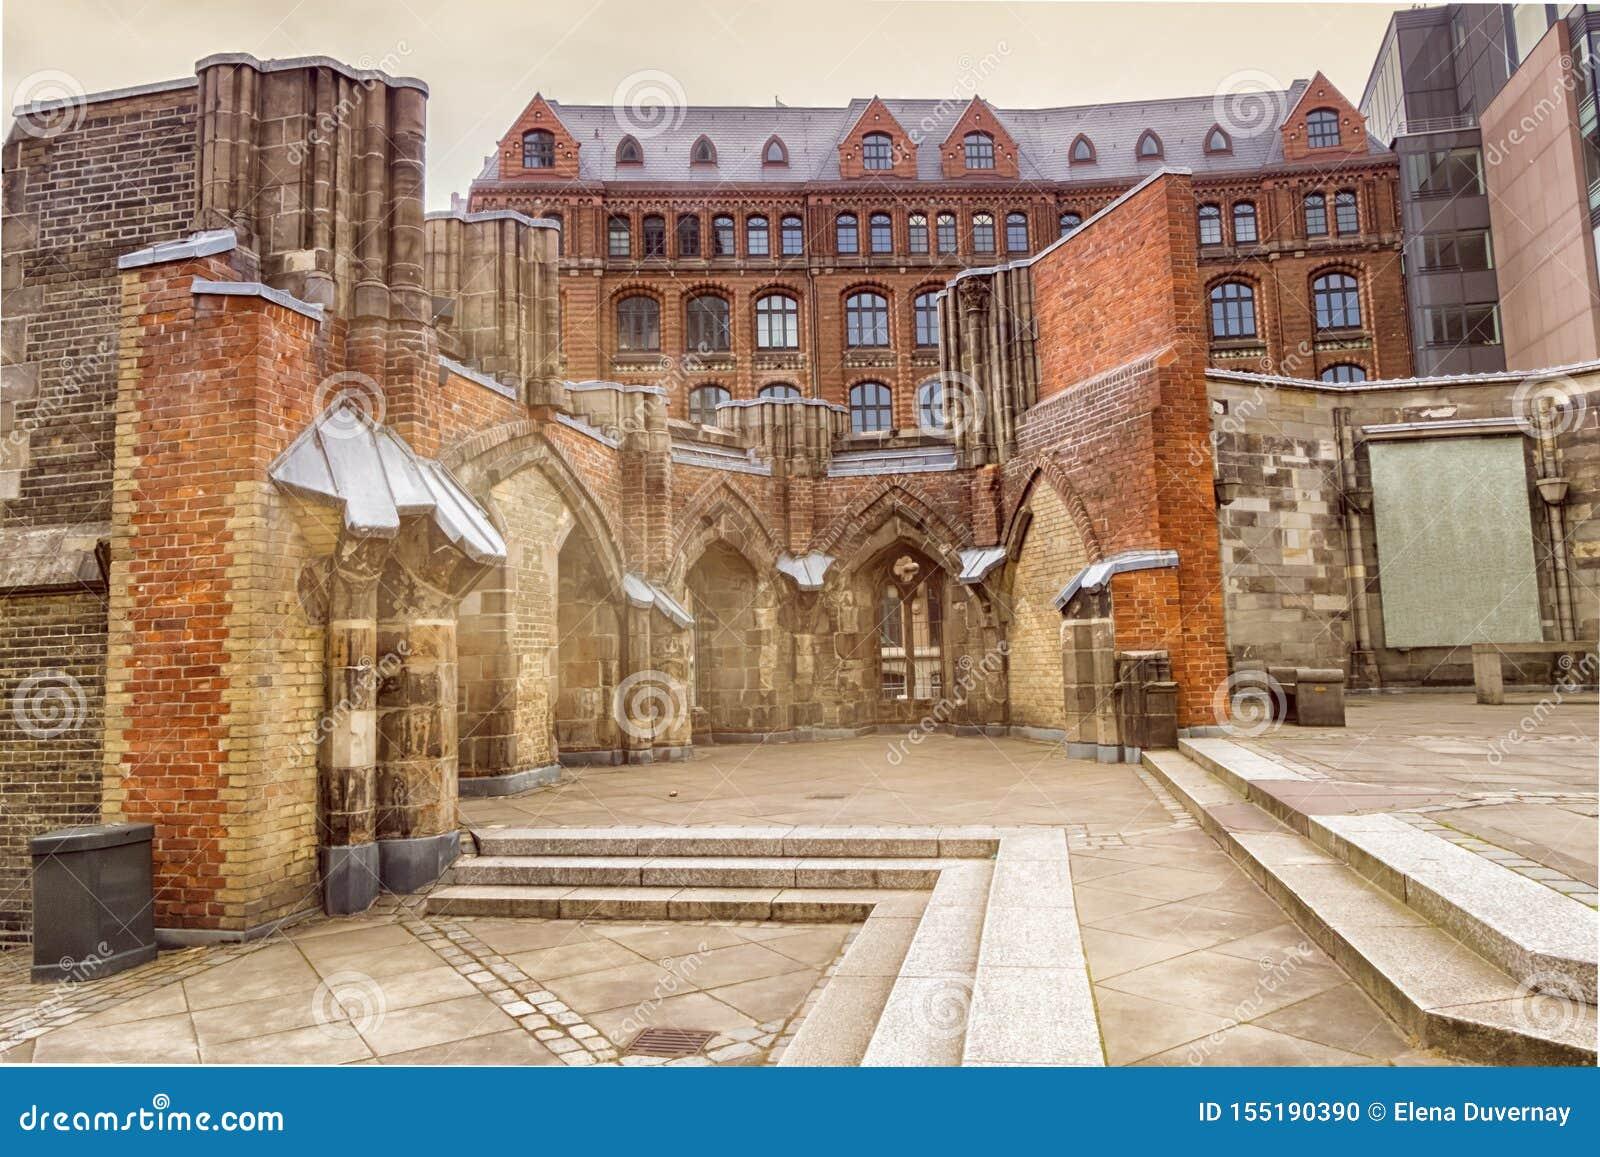 Remains of the Saint Nicholas church, Hamburg, Germany